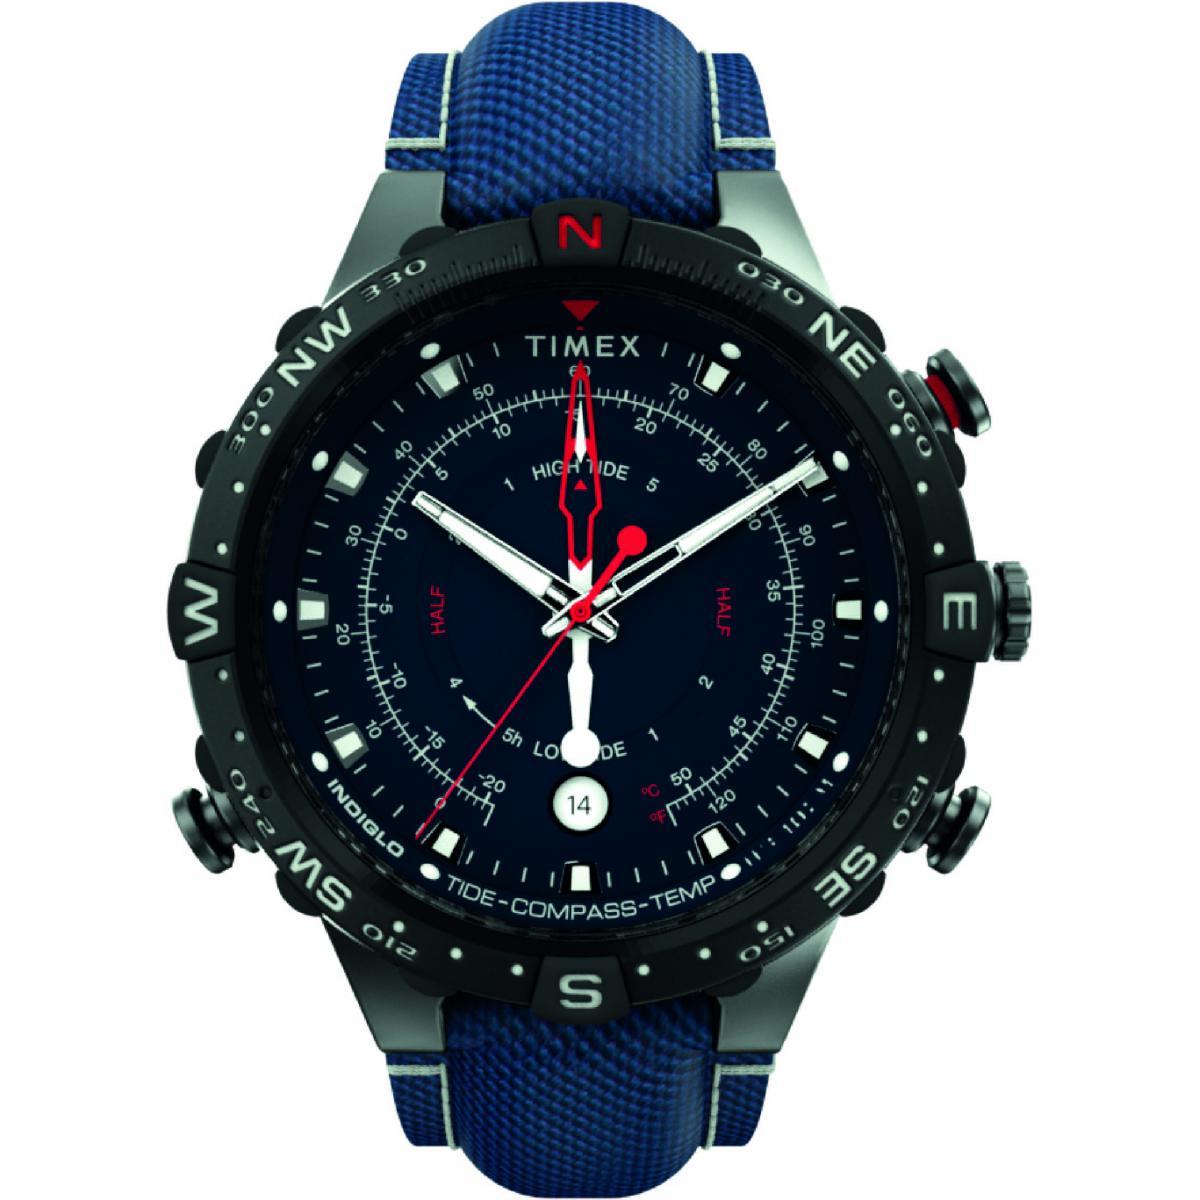 Montre Timex Montres Allied Tide Temp Compass Tw2t